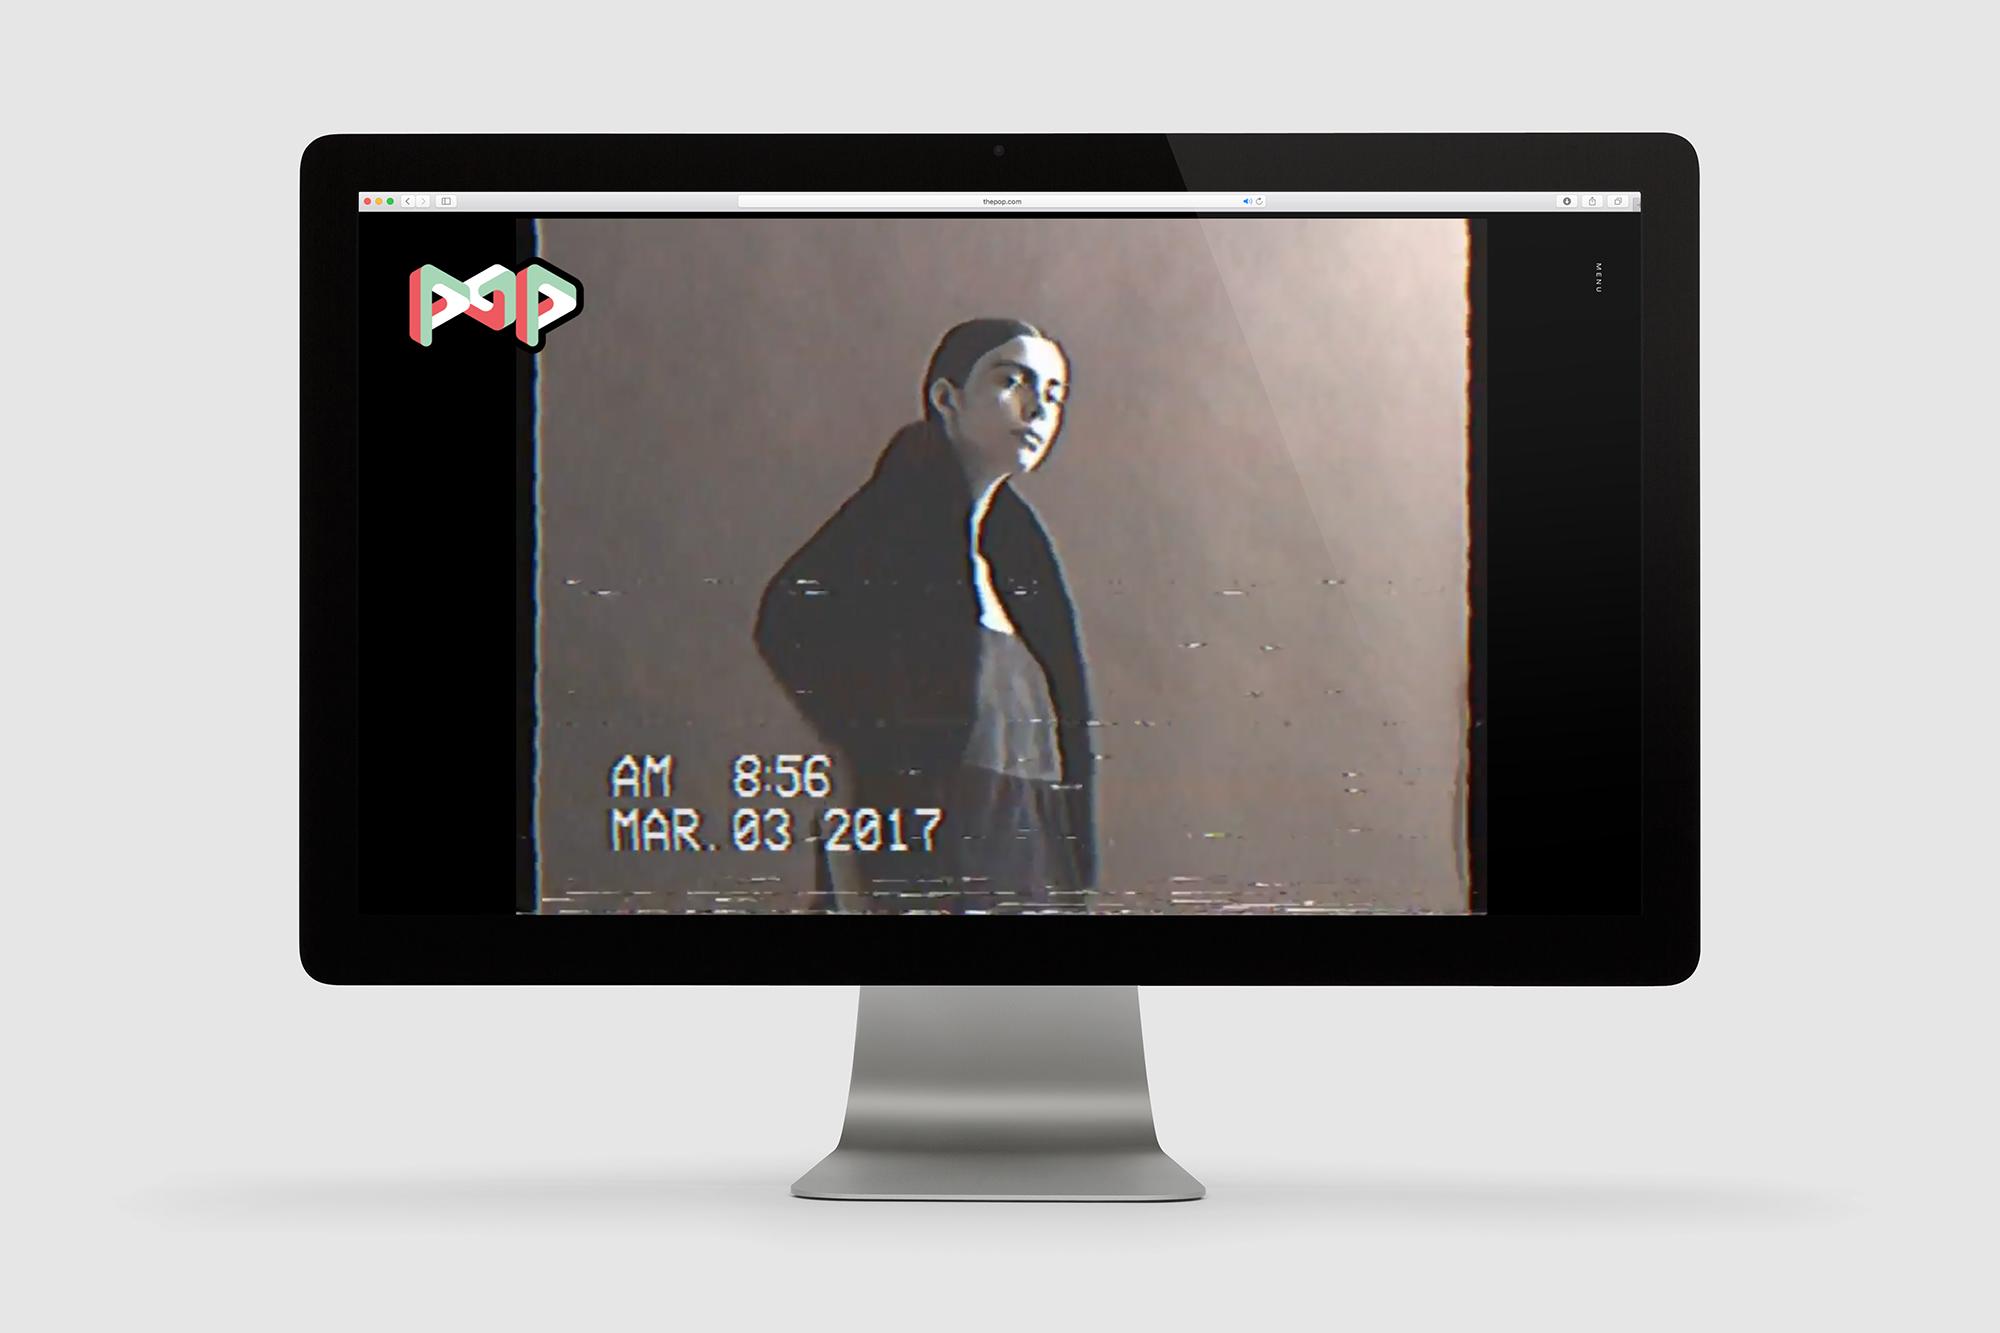 Display 0633 2017-03-09_1_2_3_4_5_6_7_8